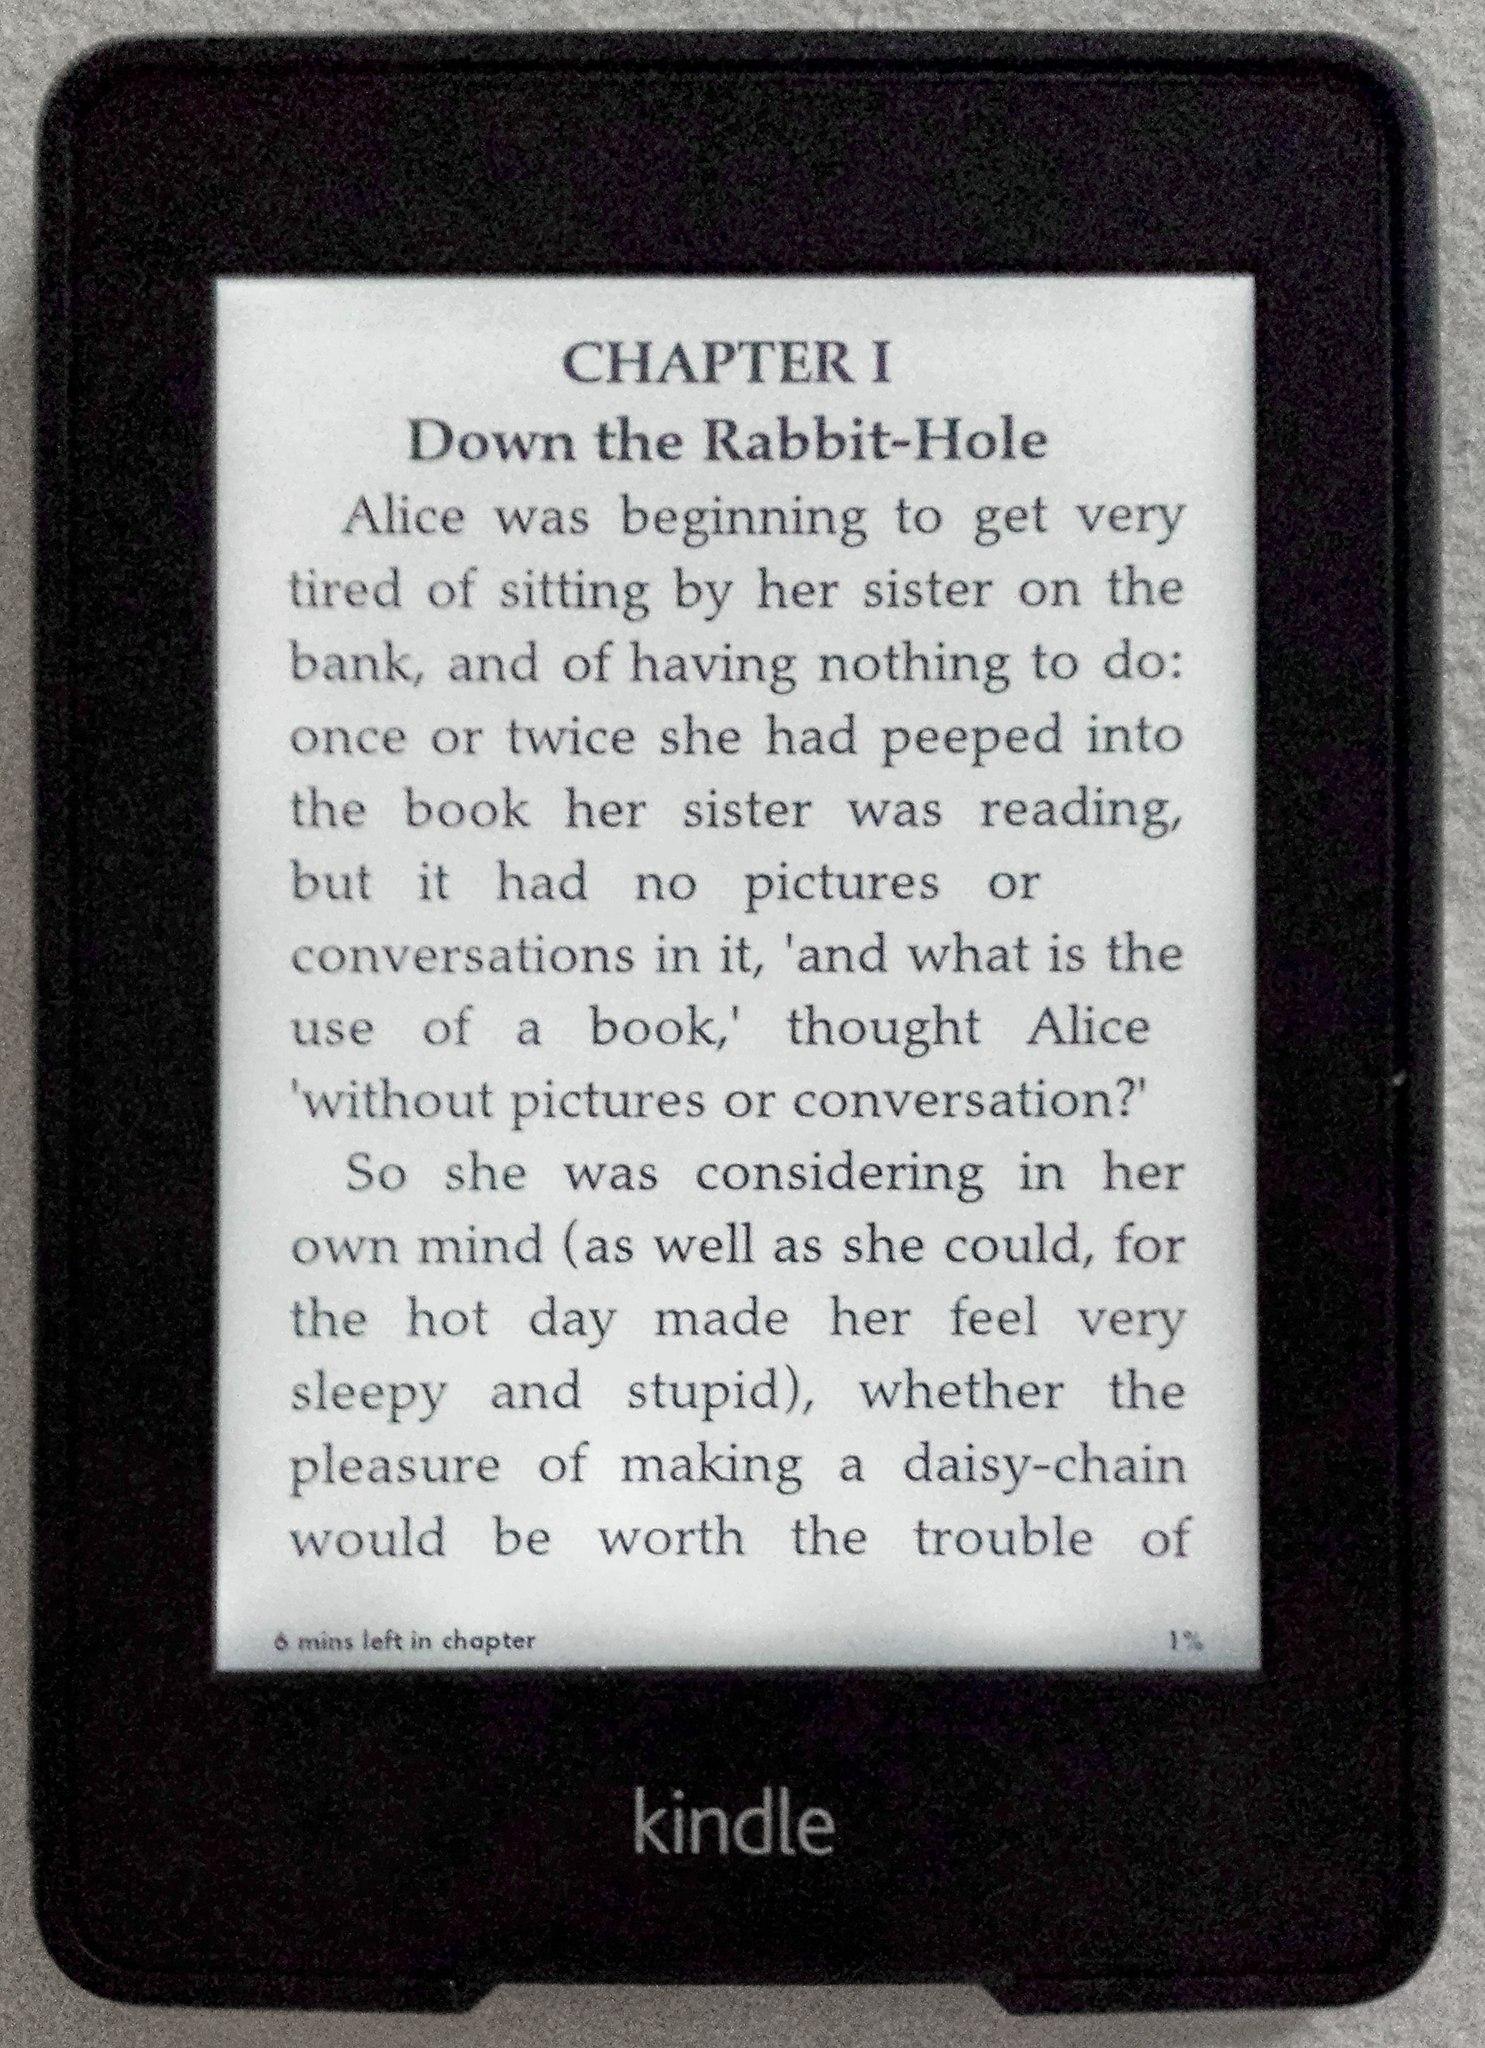 File:Kindle Paperwhite WiFi.jpg - Wikimedia Commons